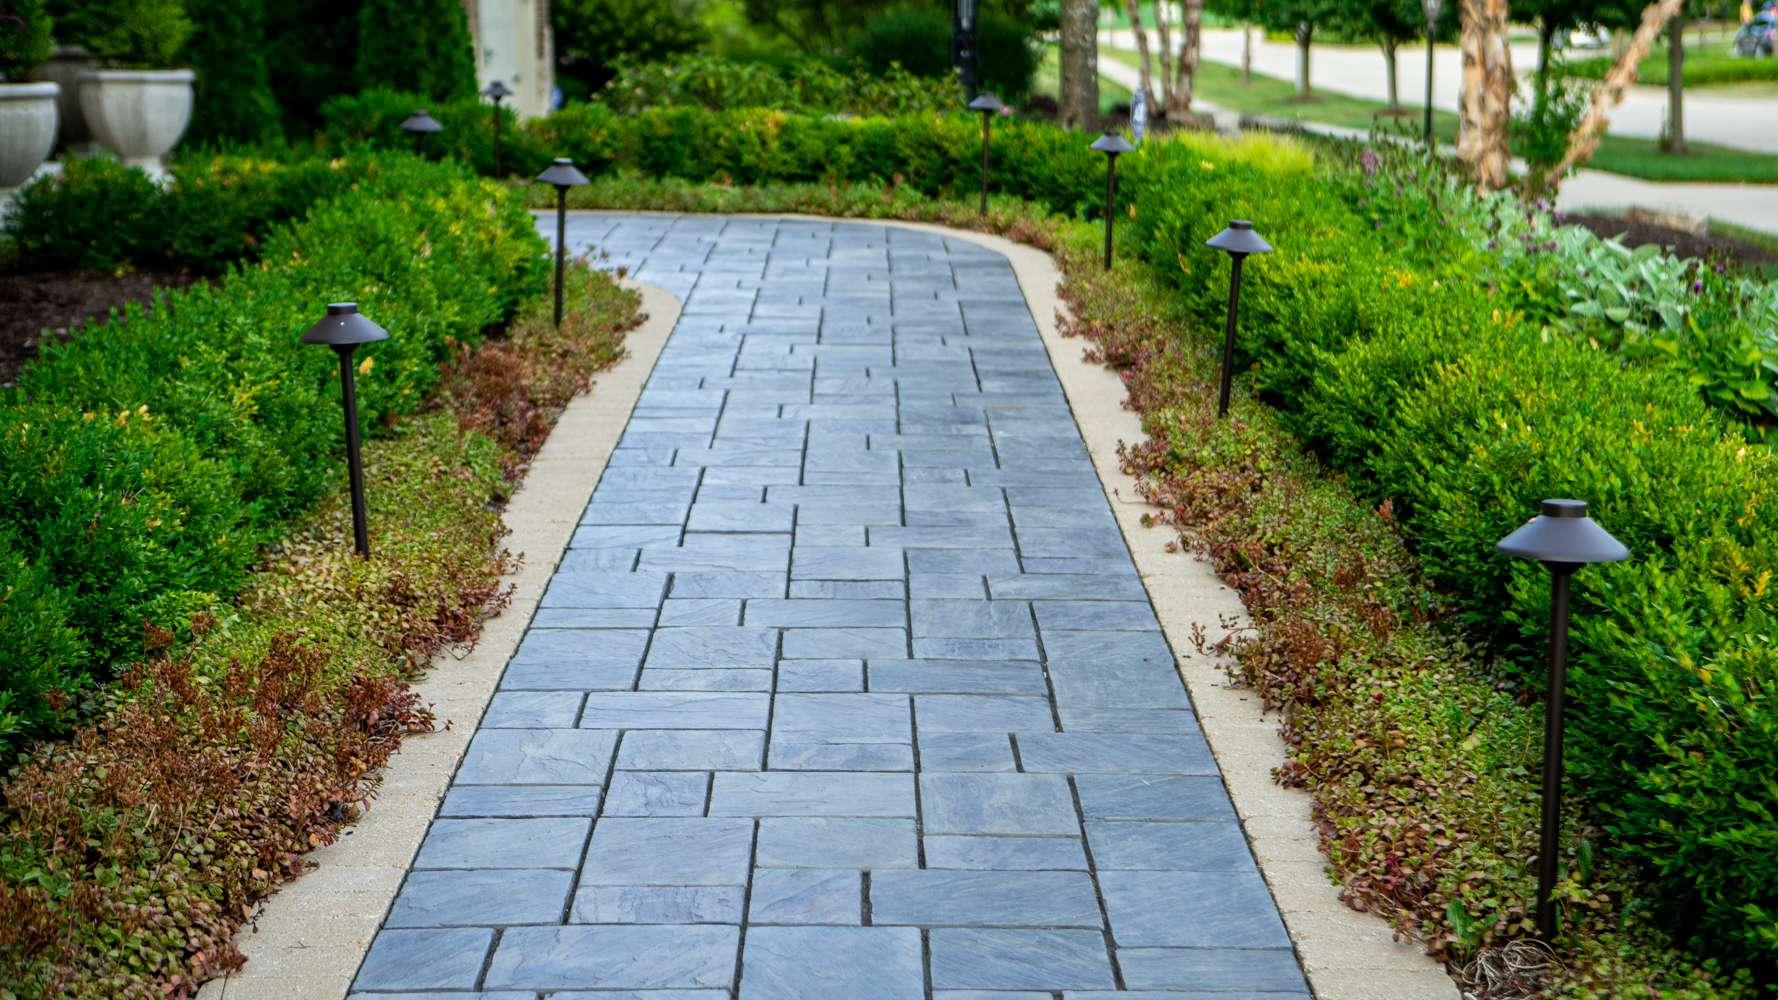 Paver pathway with lighting